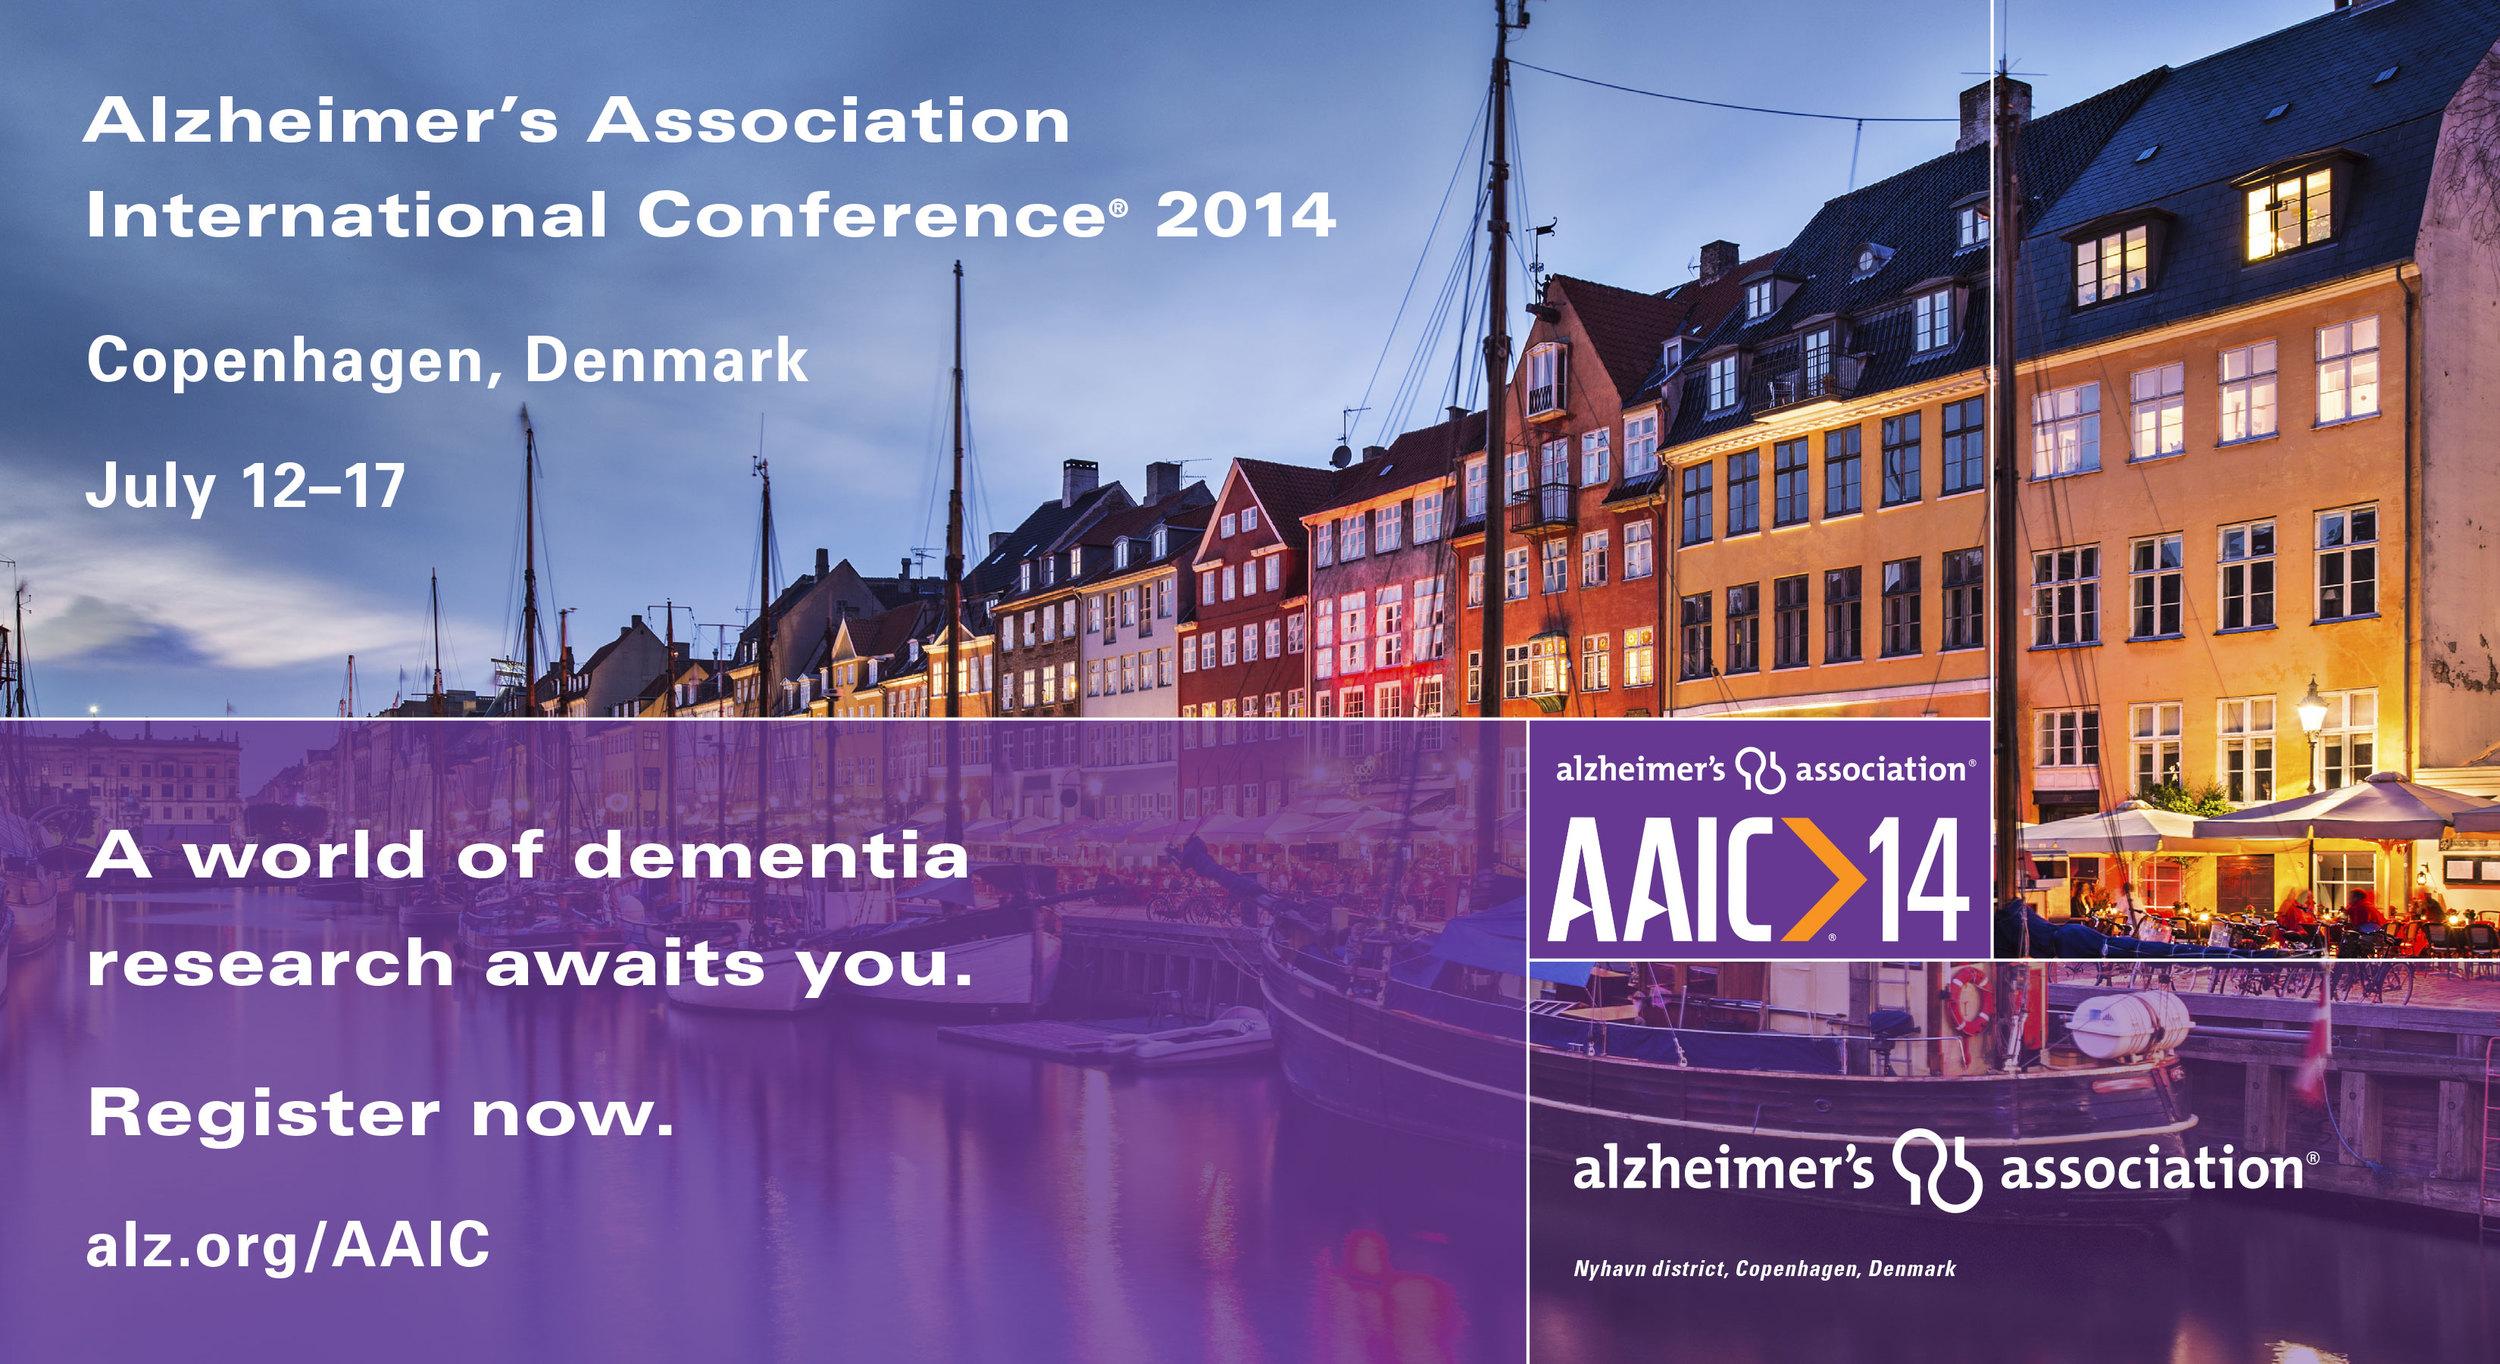 AAIC14 REGISTRATION POSTCARD